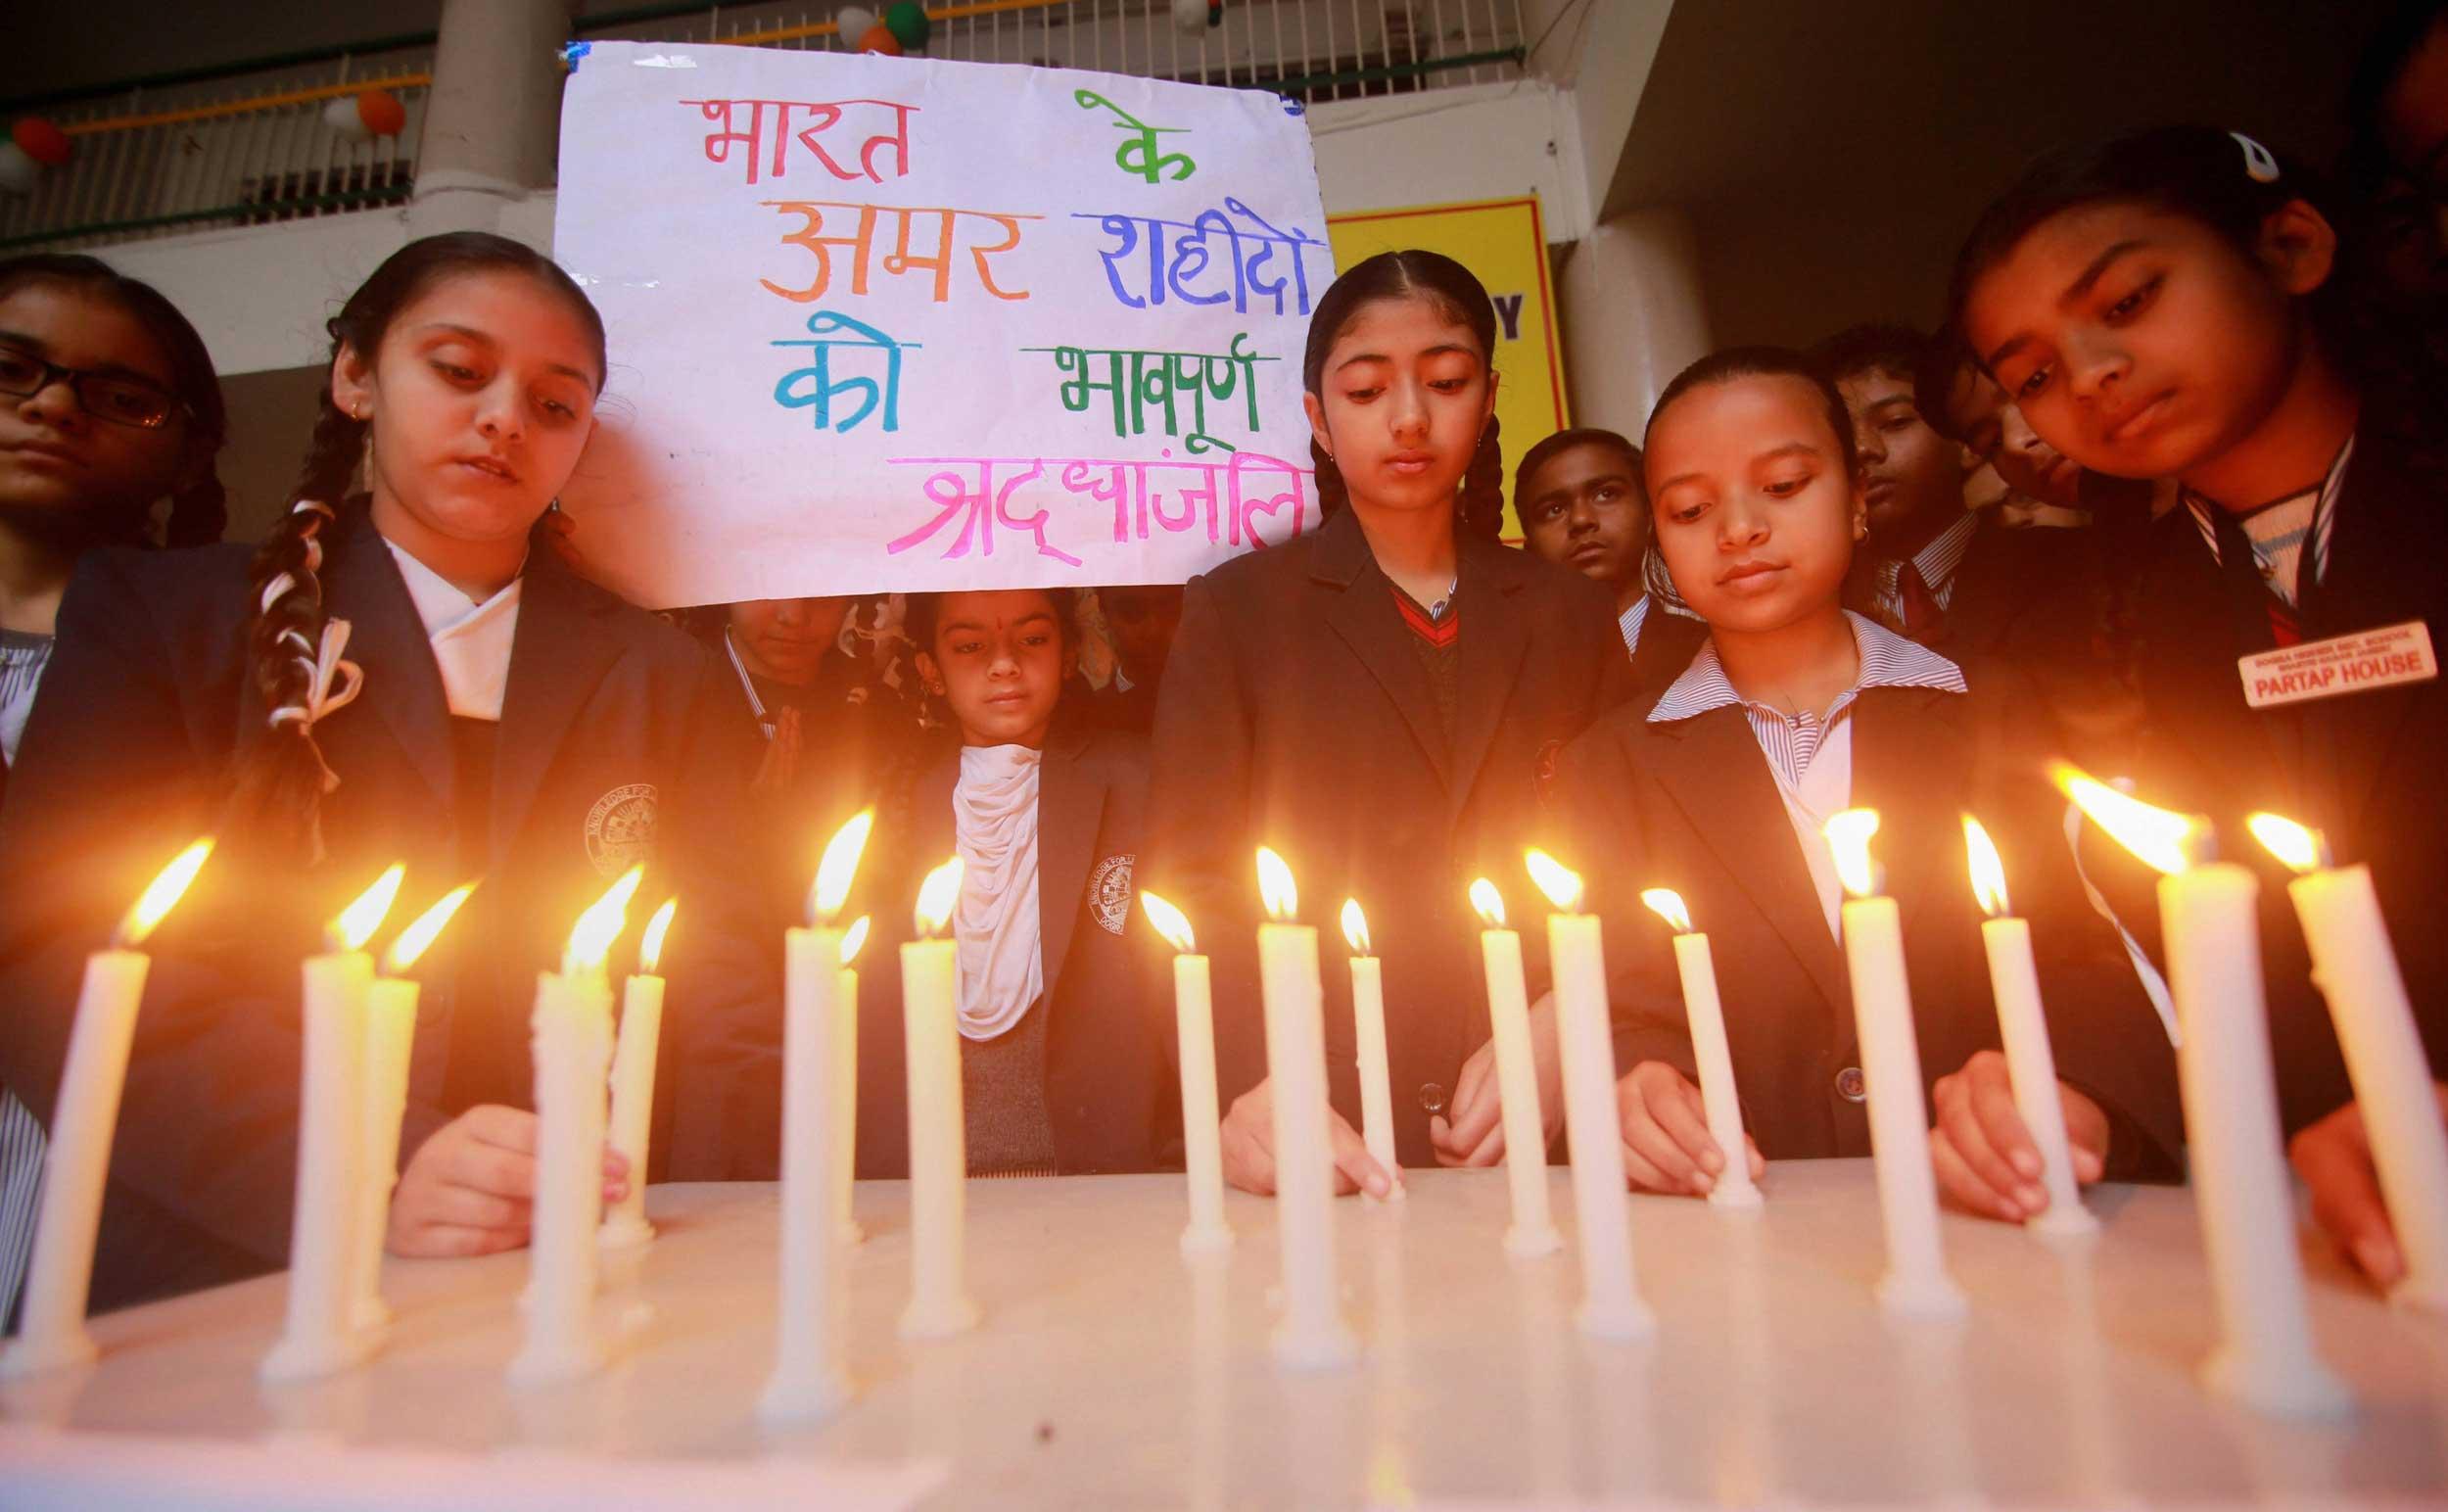 Modi finally finds time to denounce retaliatory attacks on Kashmiris